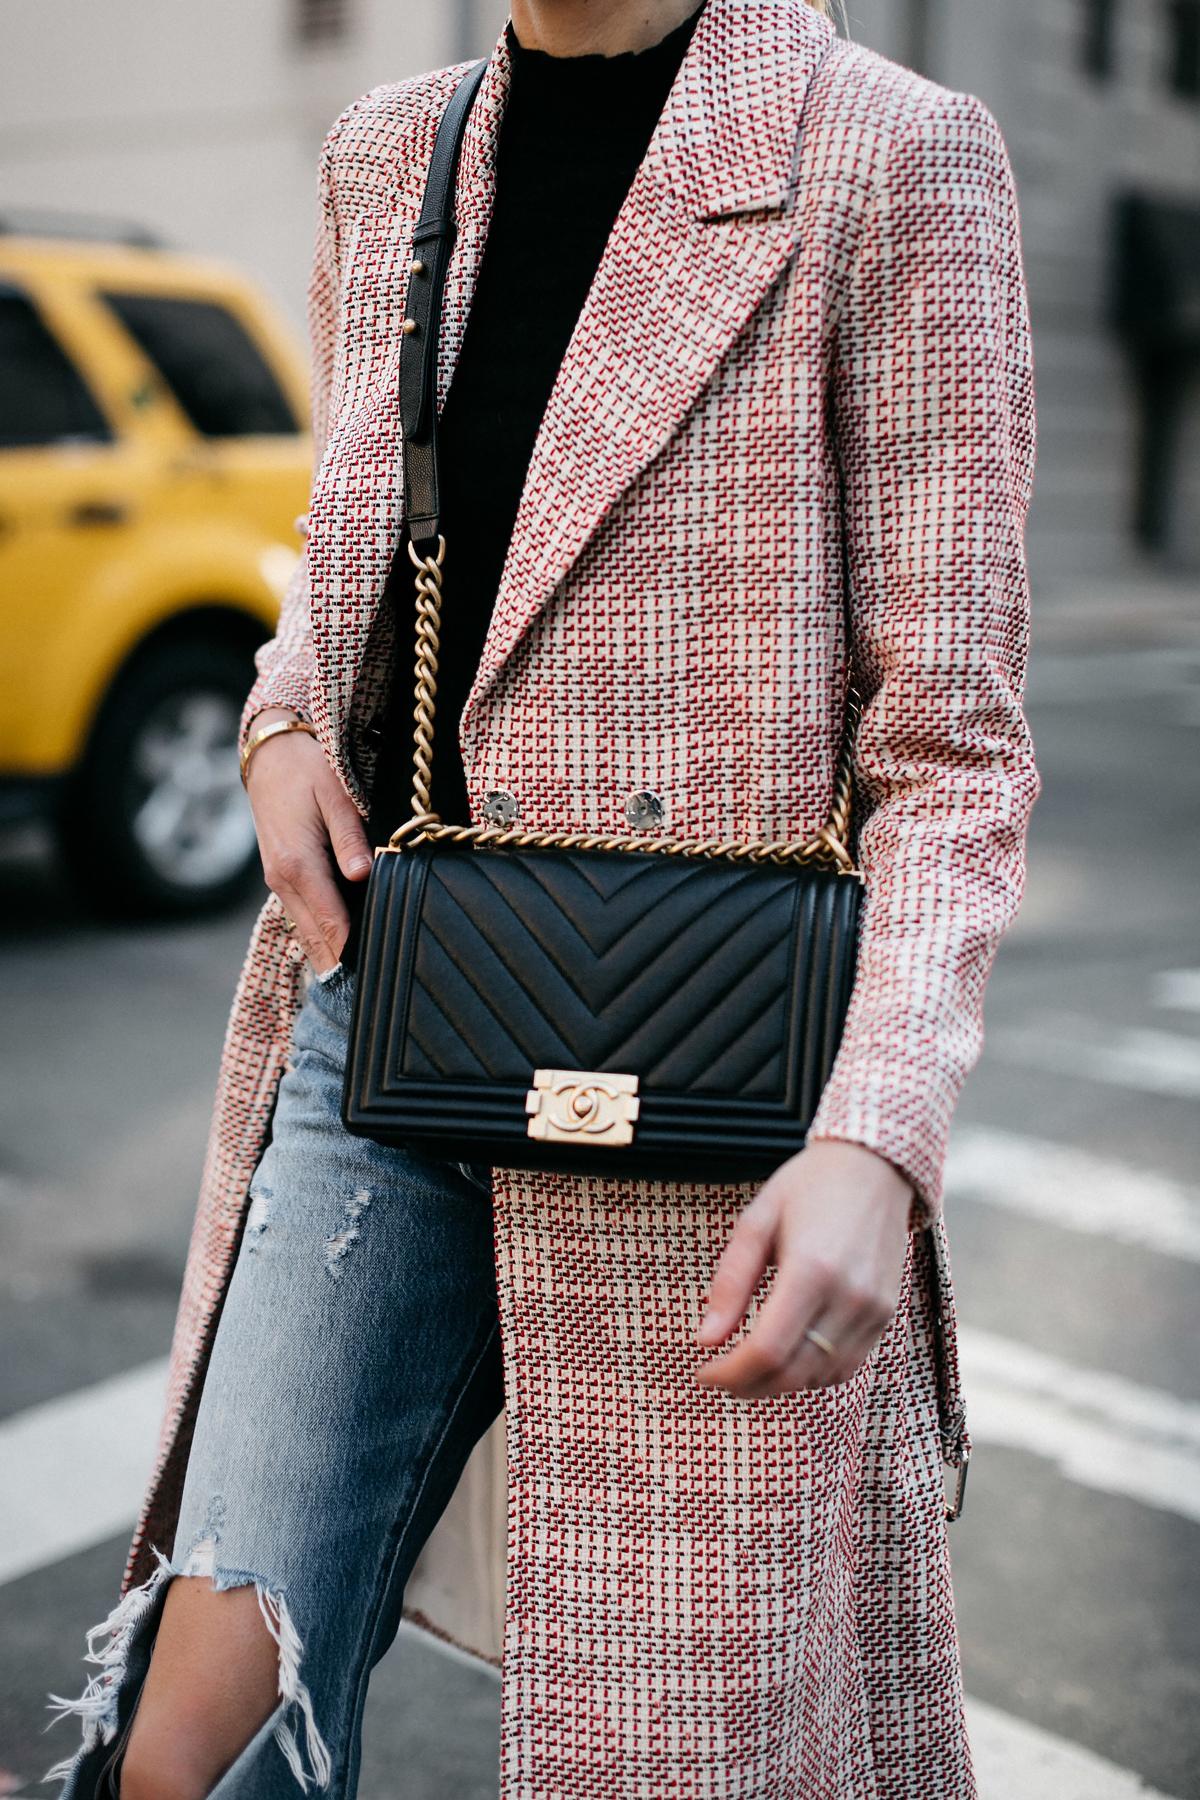 Woman Wearing HM Tweed Coat Ripped Jeans Chanel Black Chevron Boy Bag Fashion Jackson Dallas Blogger Fashion Blogger Street Style NYFW